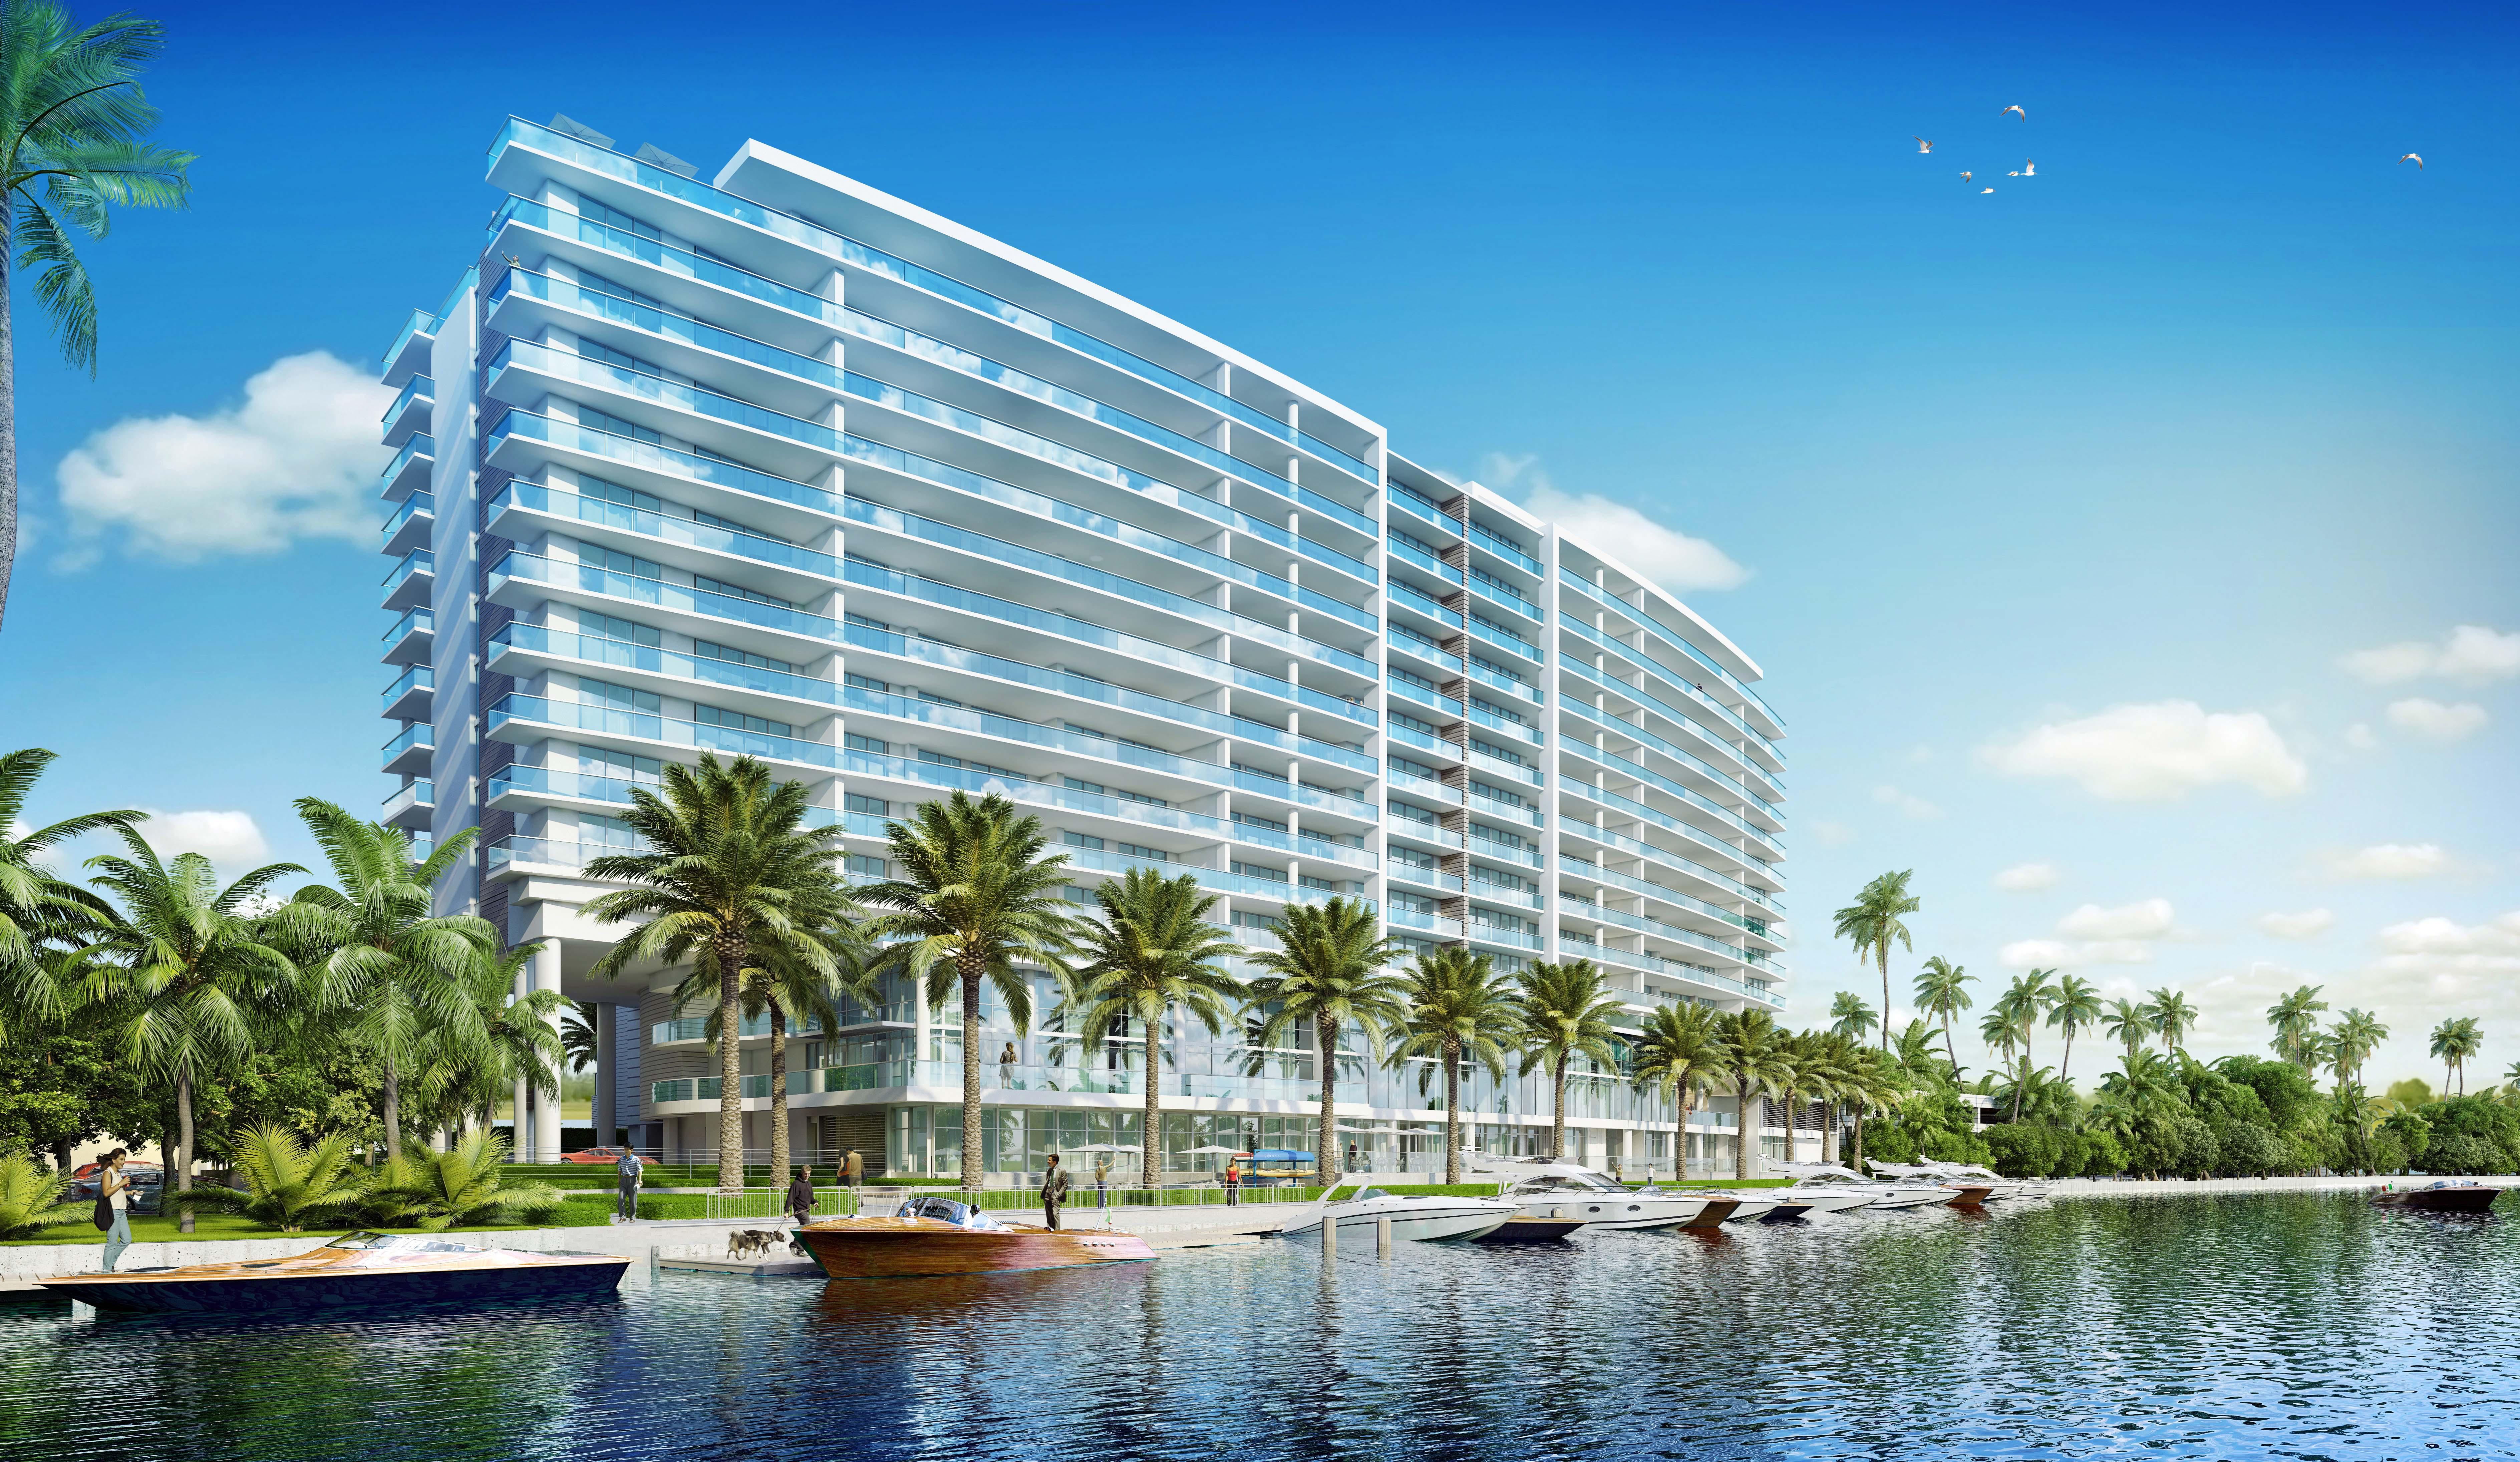 Appartement pour l Vente à 1180 N Federal Hwy #905 1180 N Federal Hwy 905 Fort Lauderdale, Florida, 33304 États-Unis